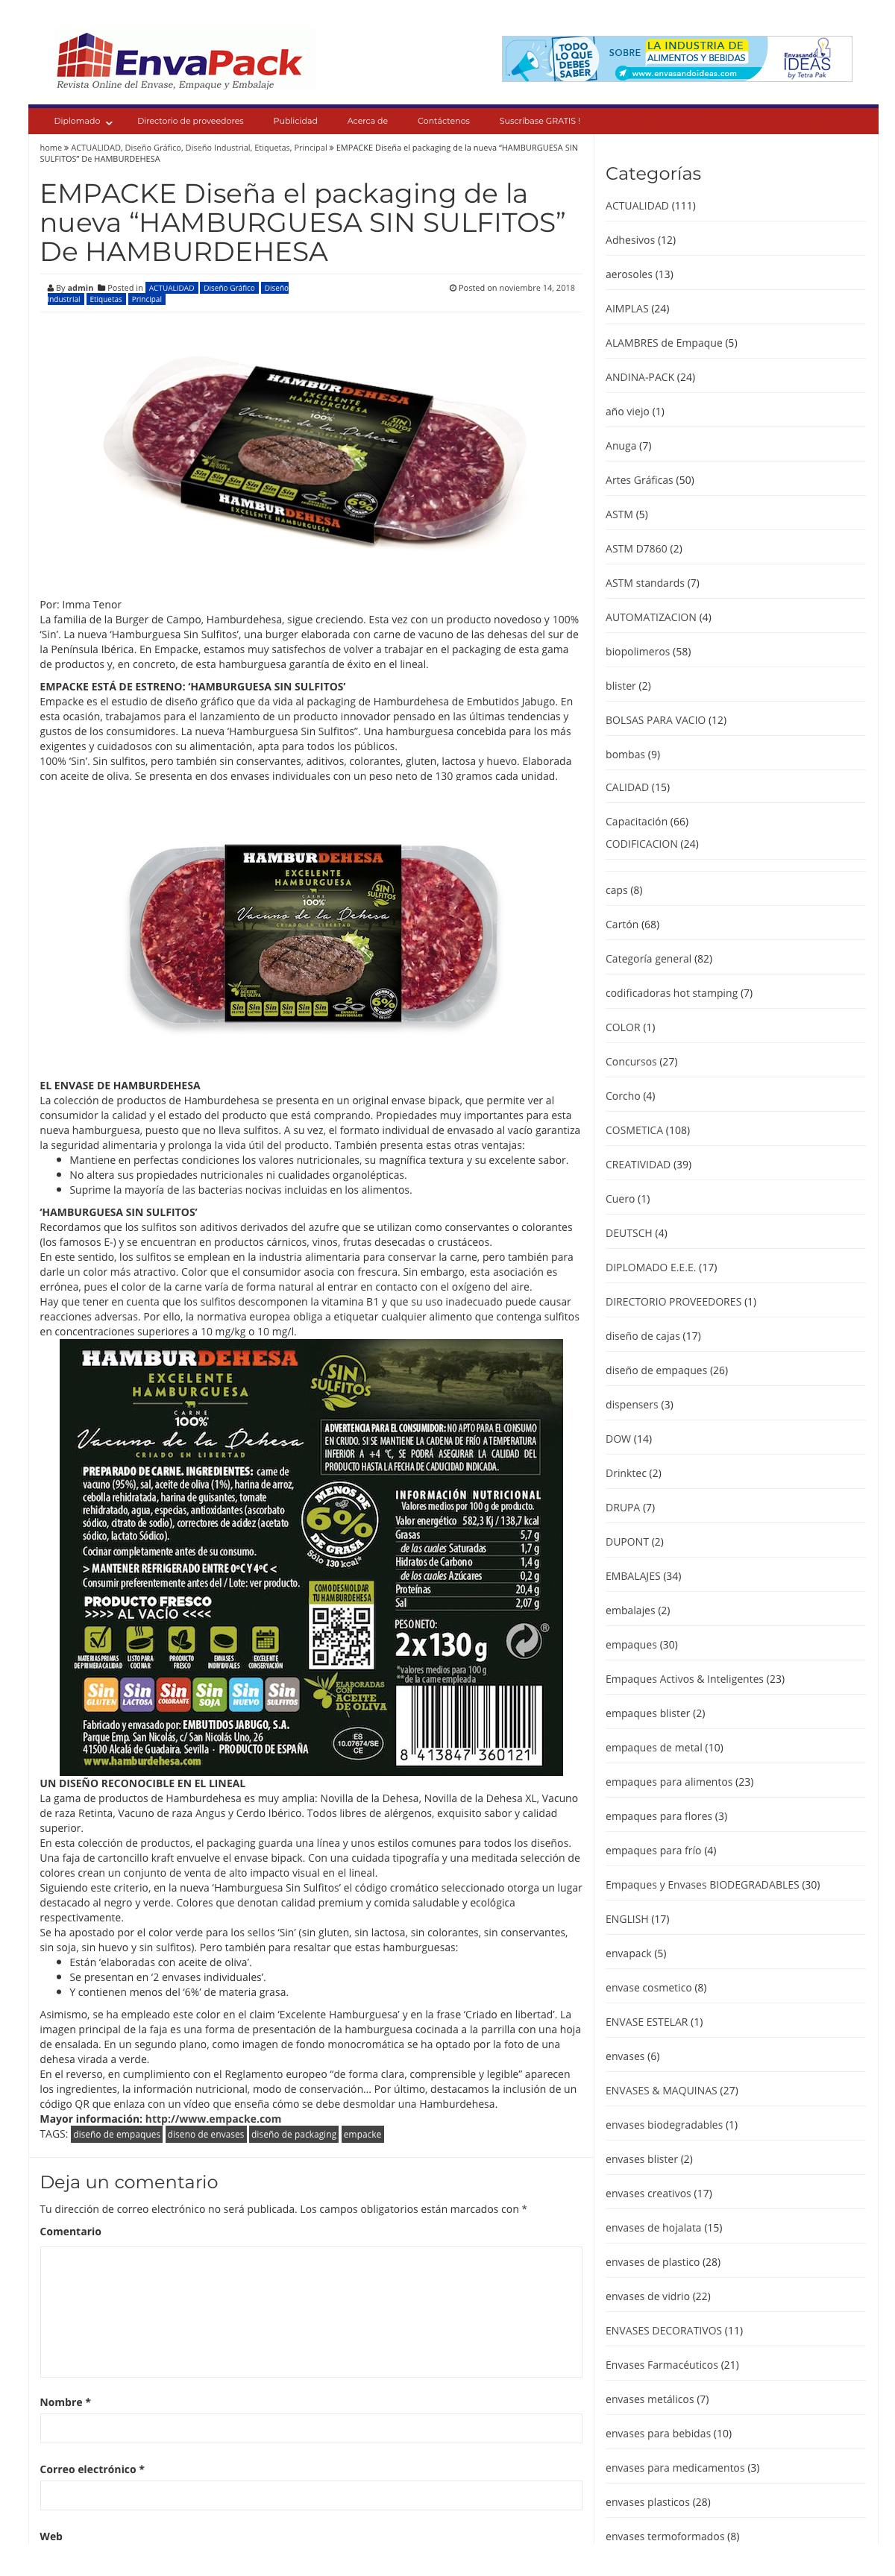 diseño de packaging para Hamburdehesa